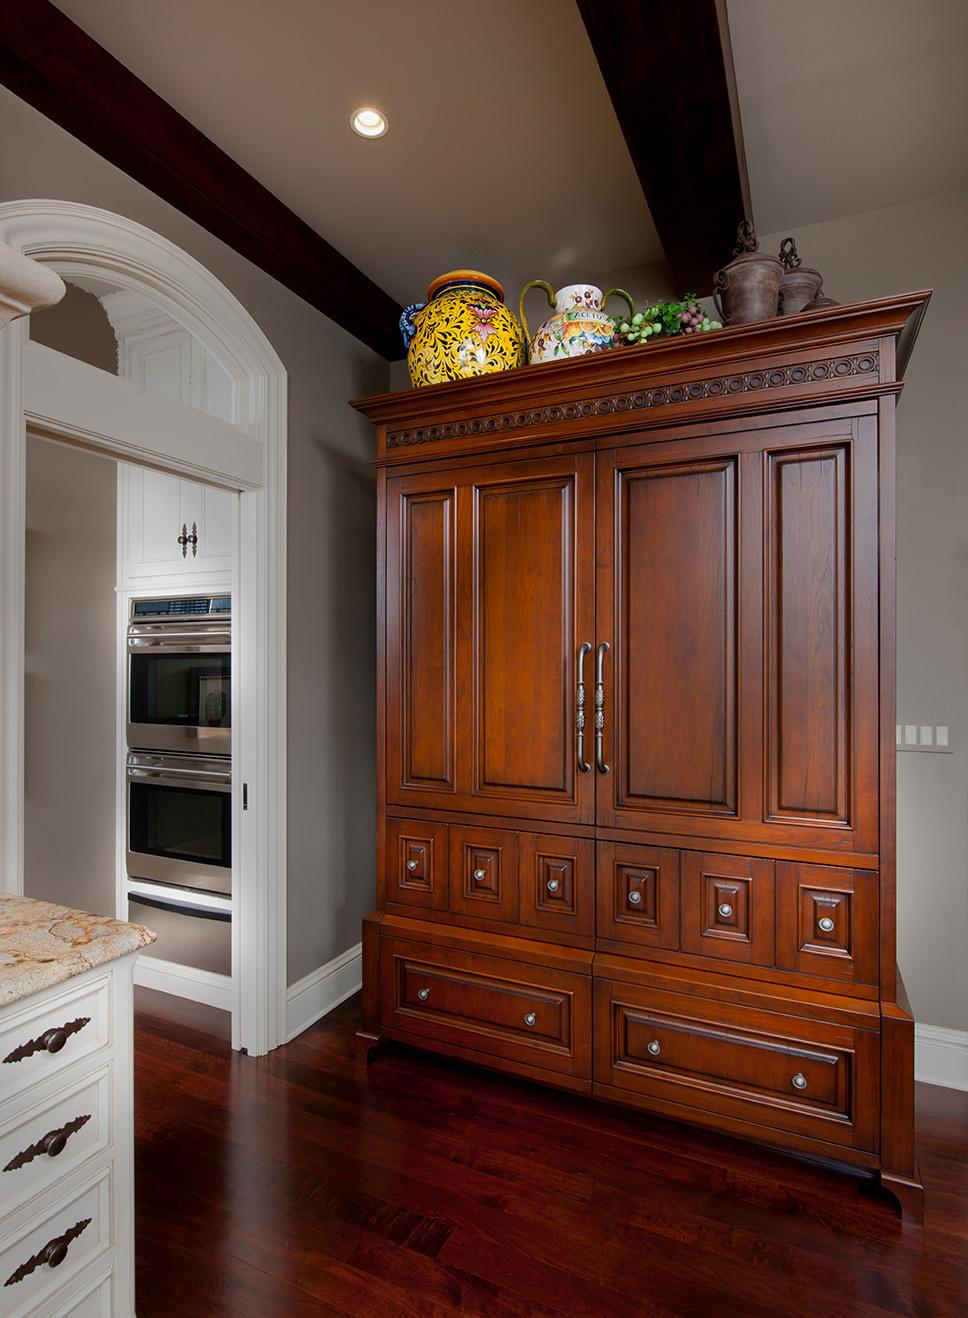 kitchen_bath_concepts_wholehome7_15.jpg